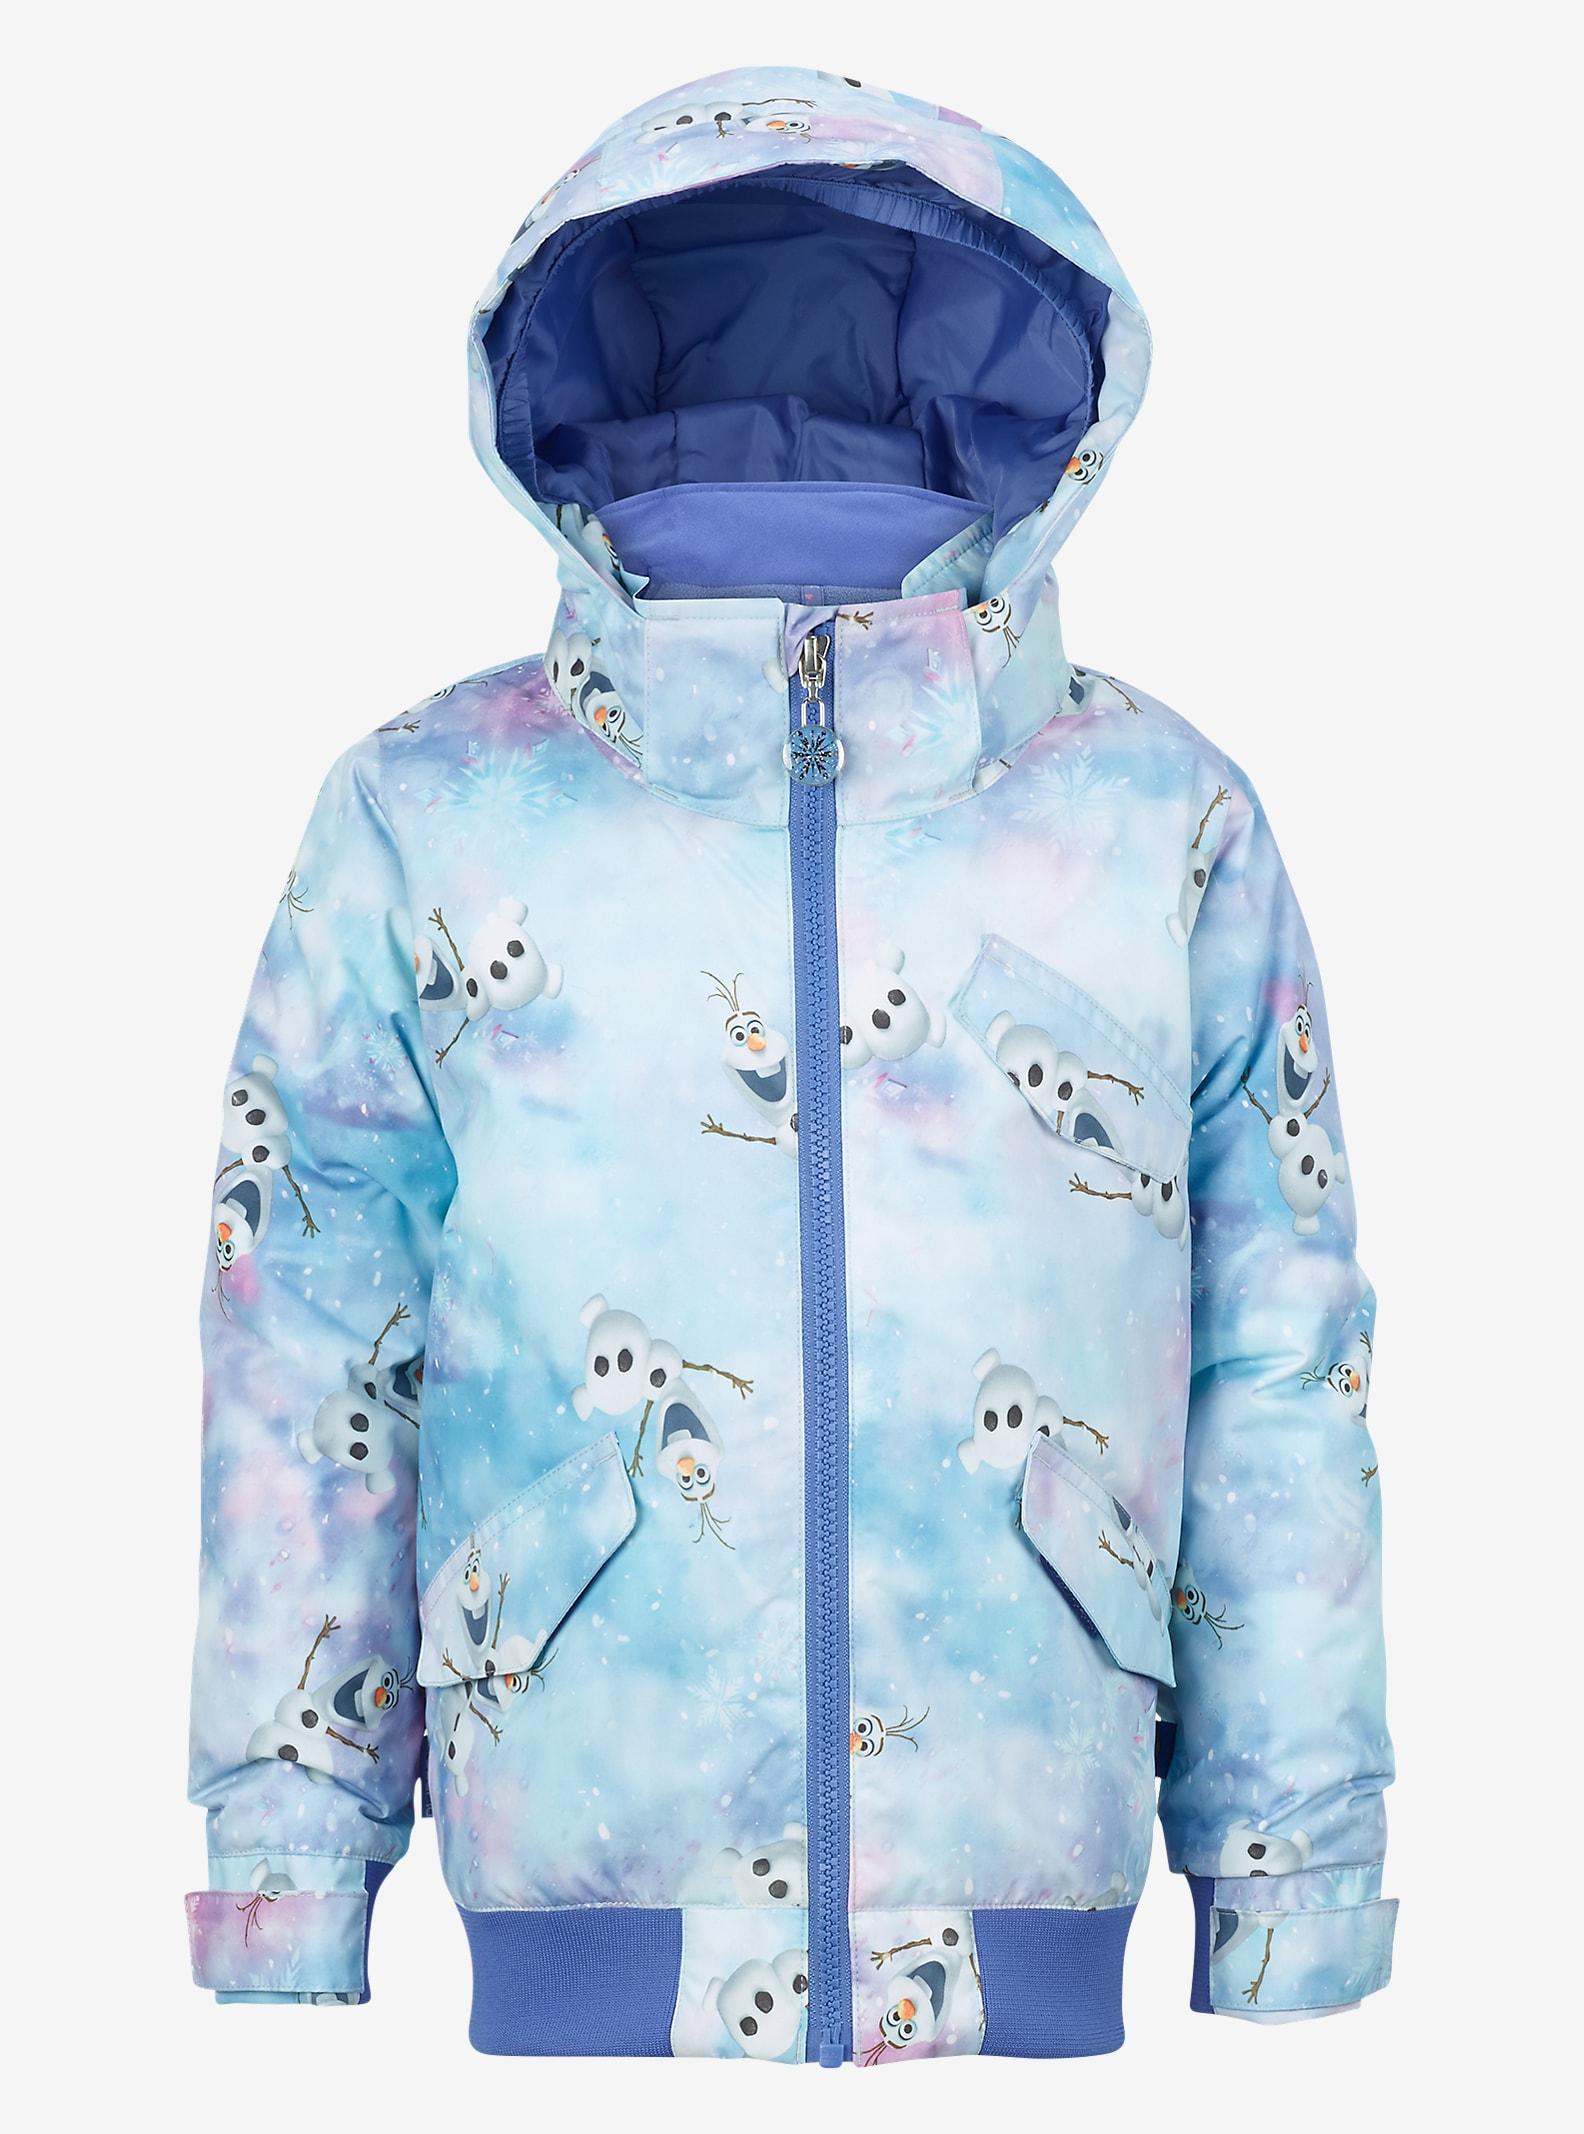 Disney Frozen Girls' Minishred Twist Bomber Jacket shown in Olaf Frozen Print © Disney